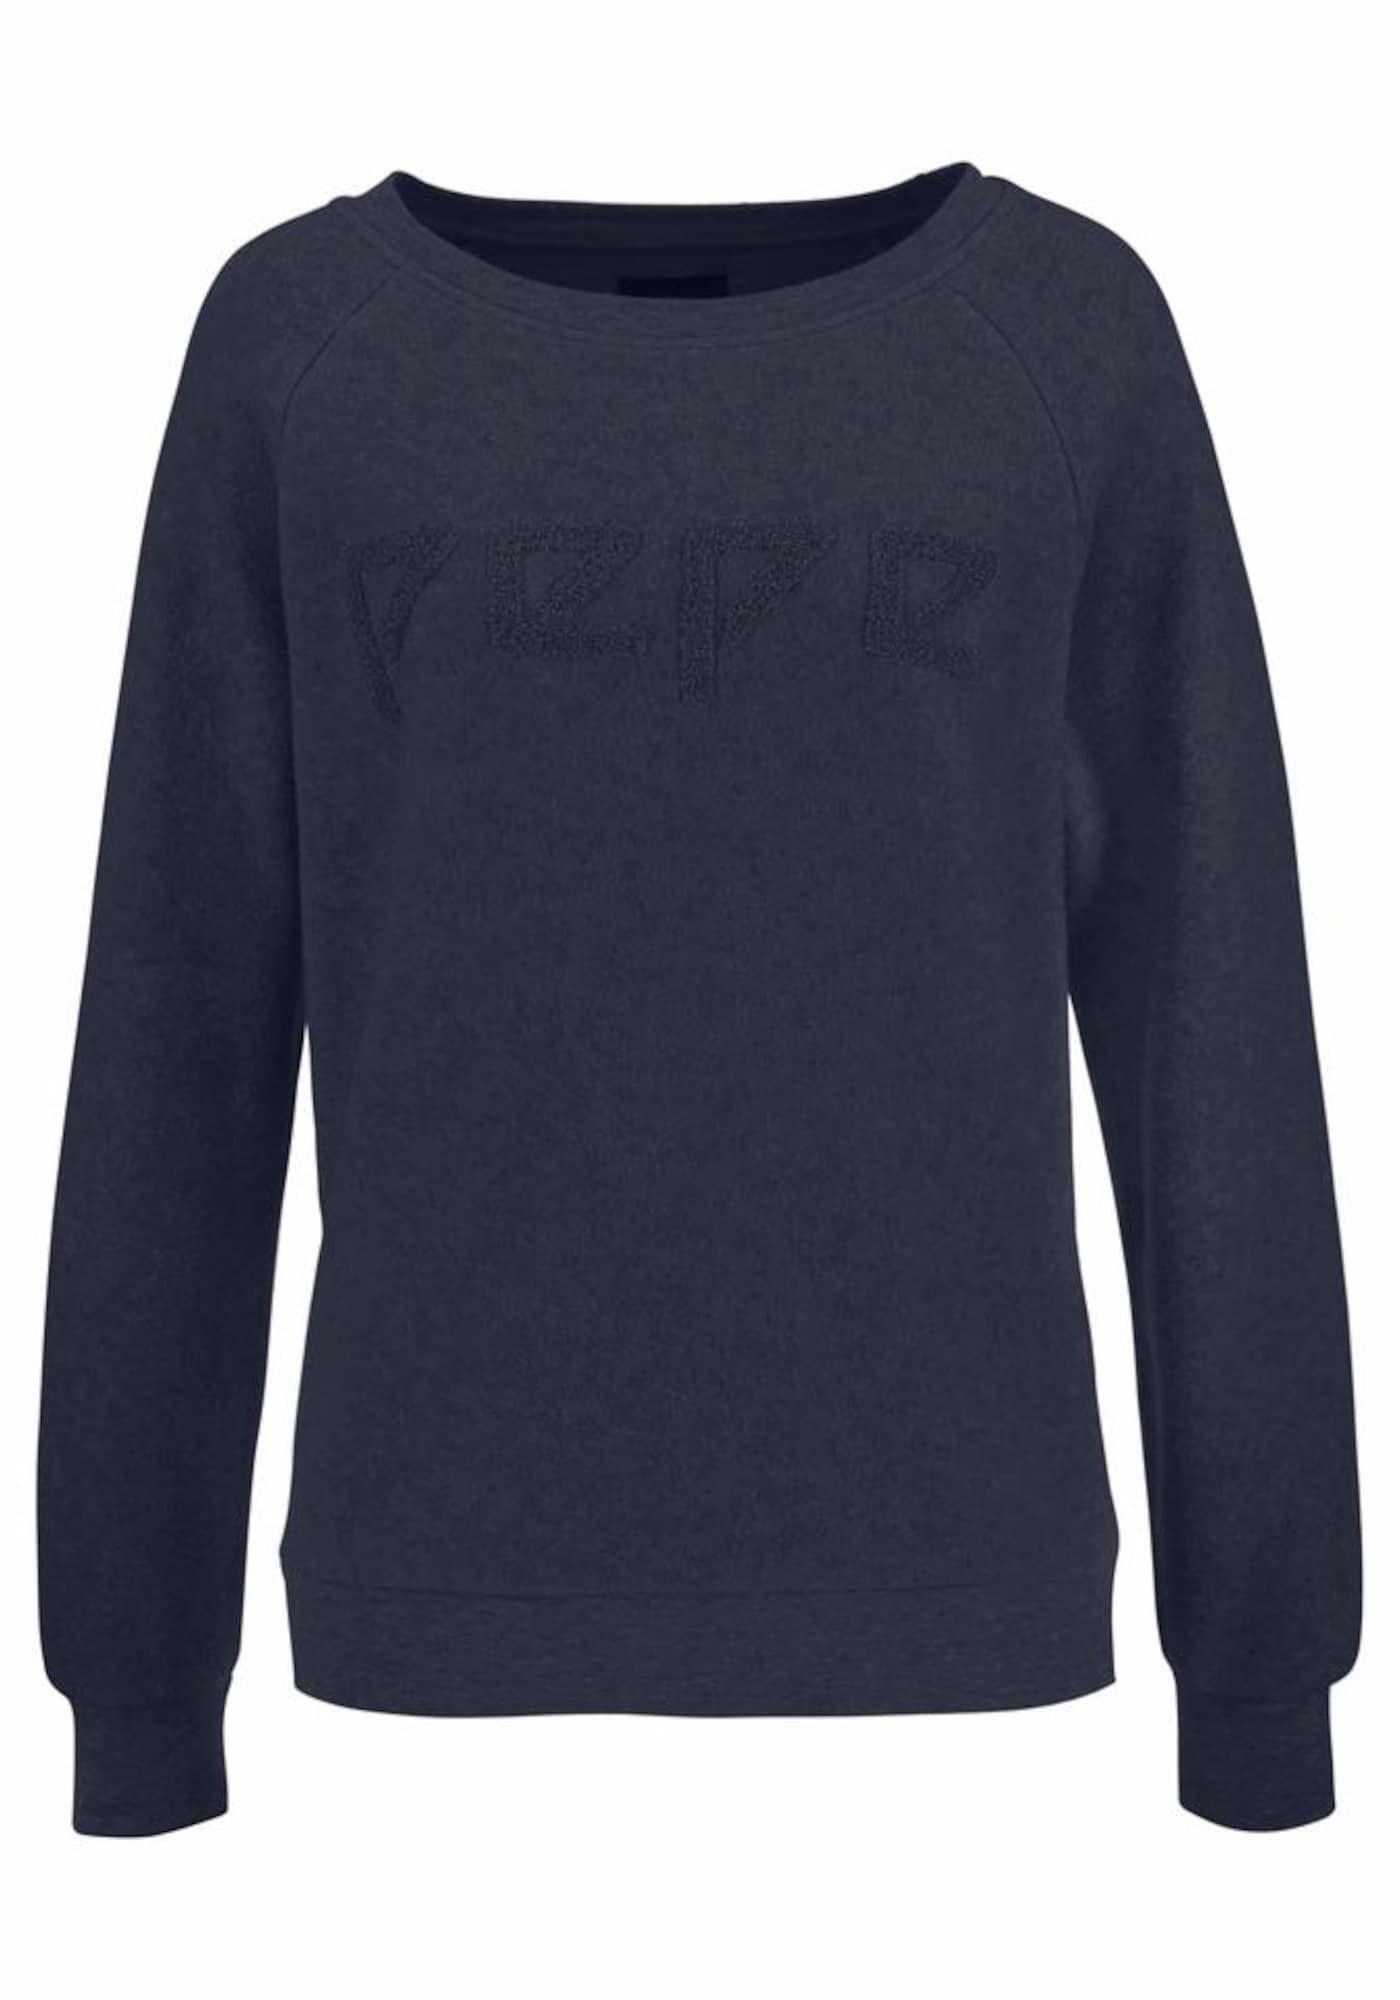 Pepe Jeans Dames Sweatshirt NANA navy